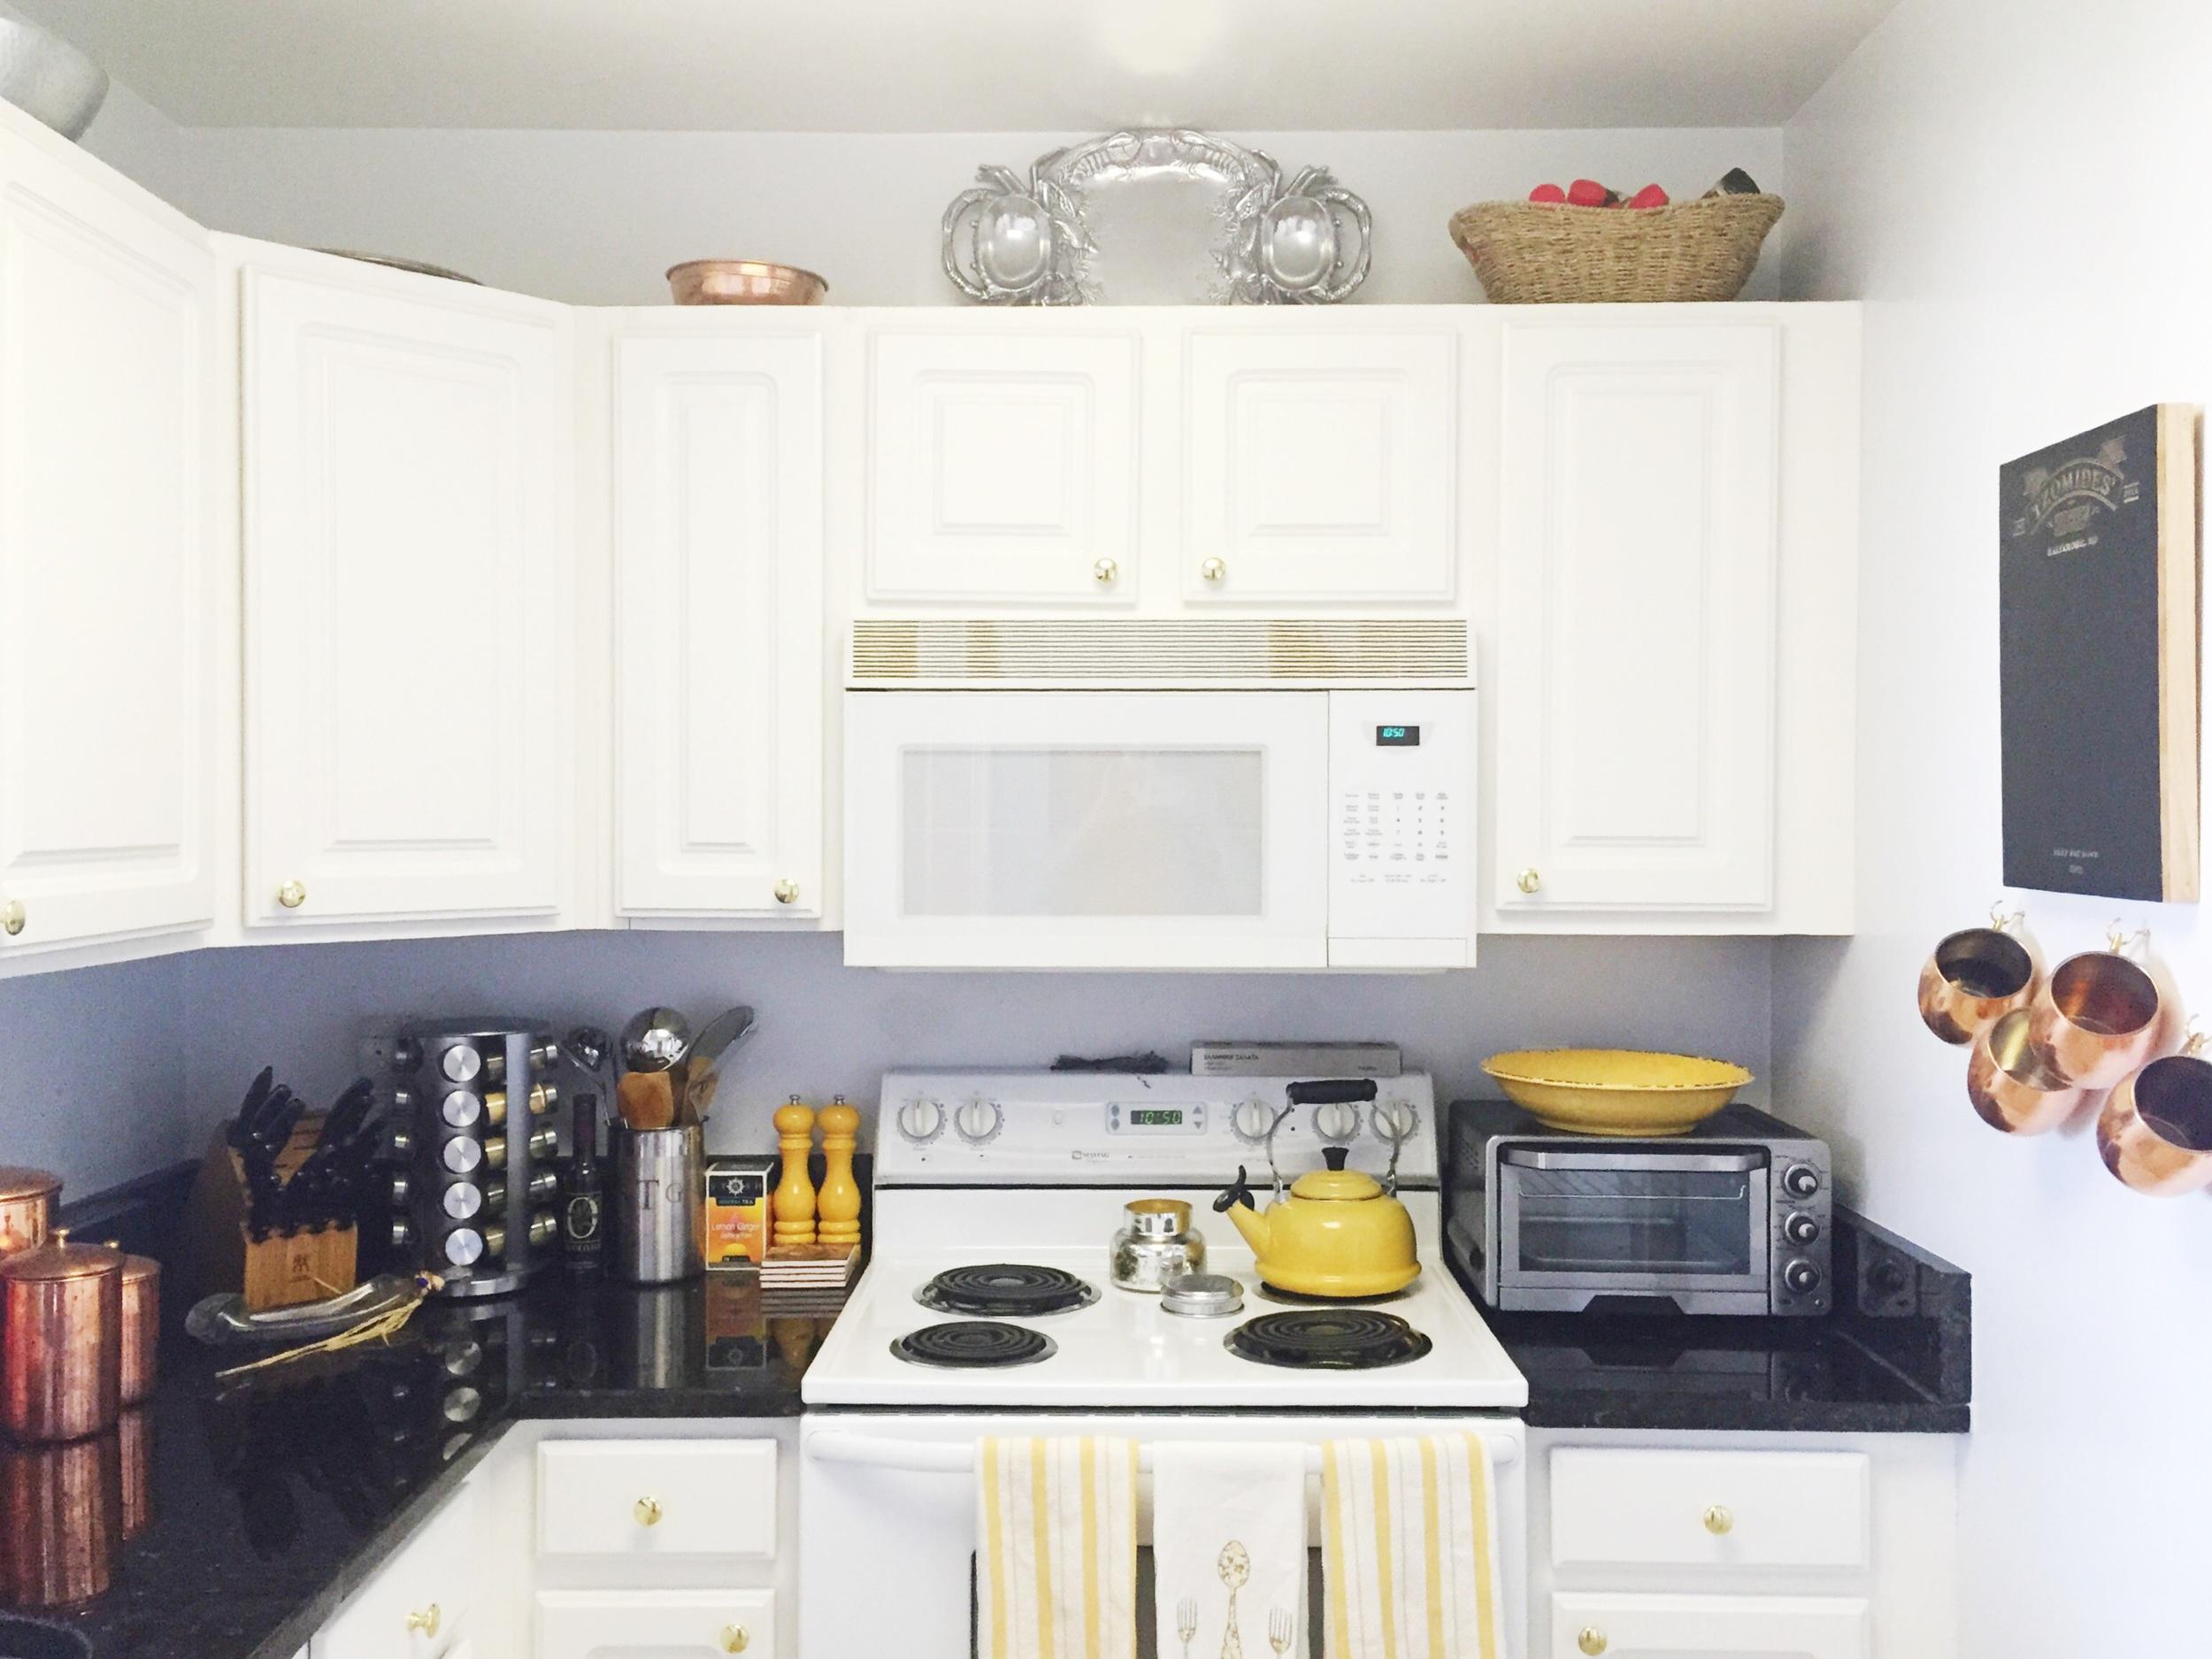 My little kitchen// Copper + Yellow + Bright